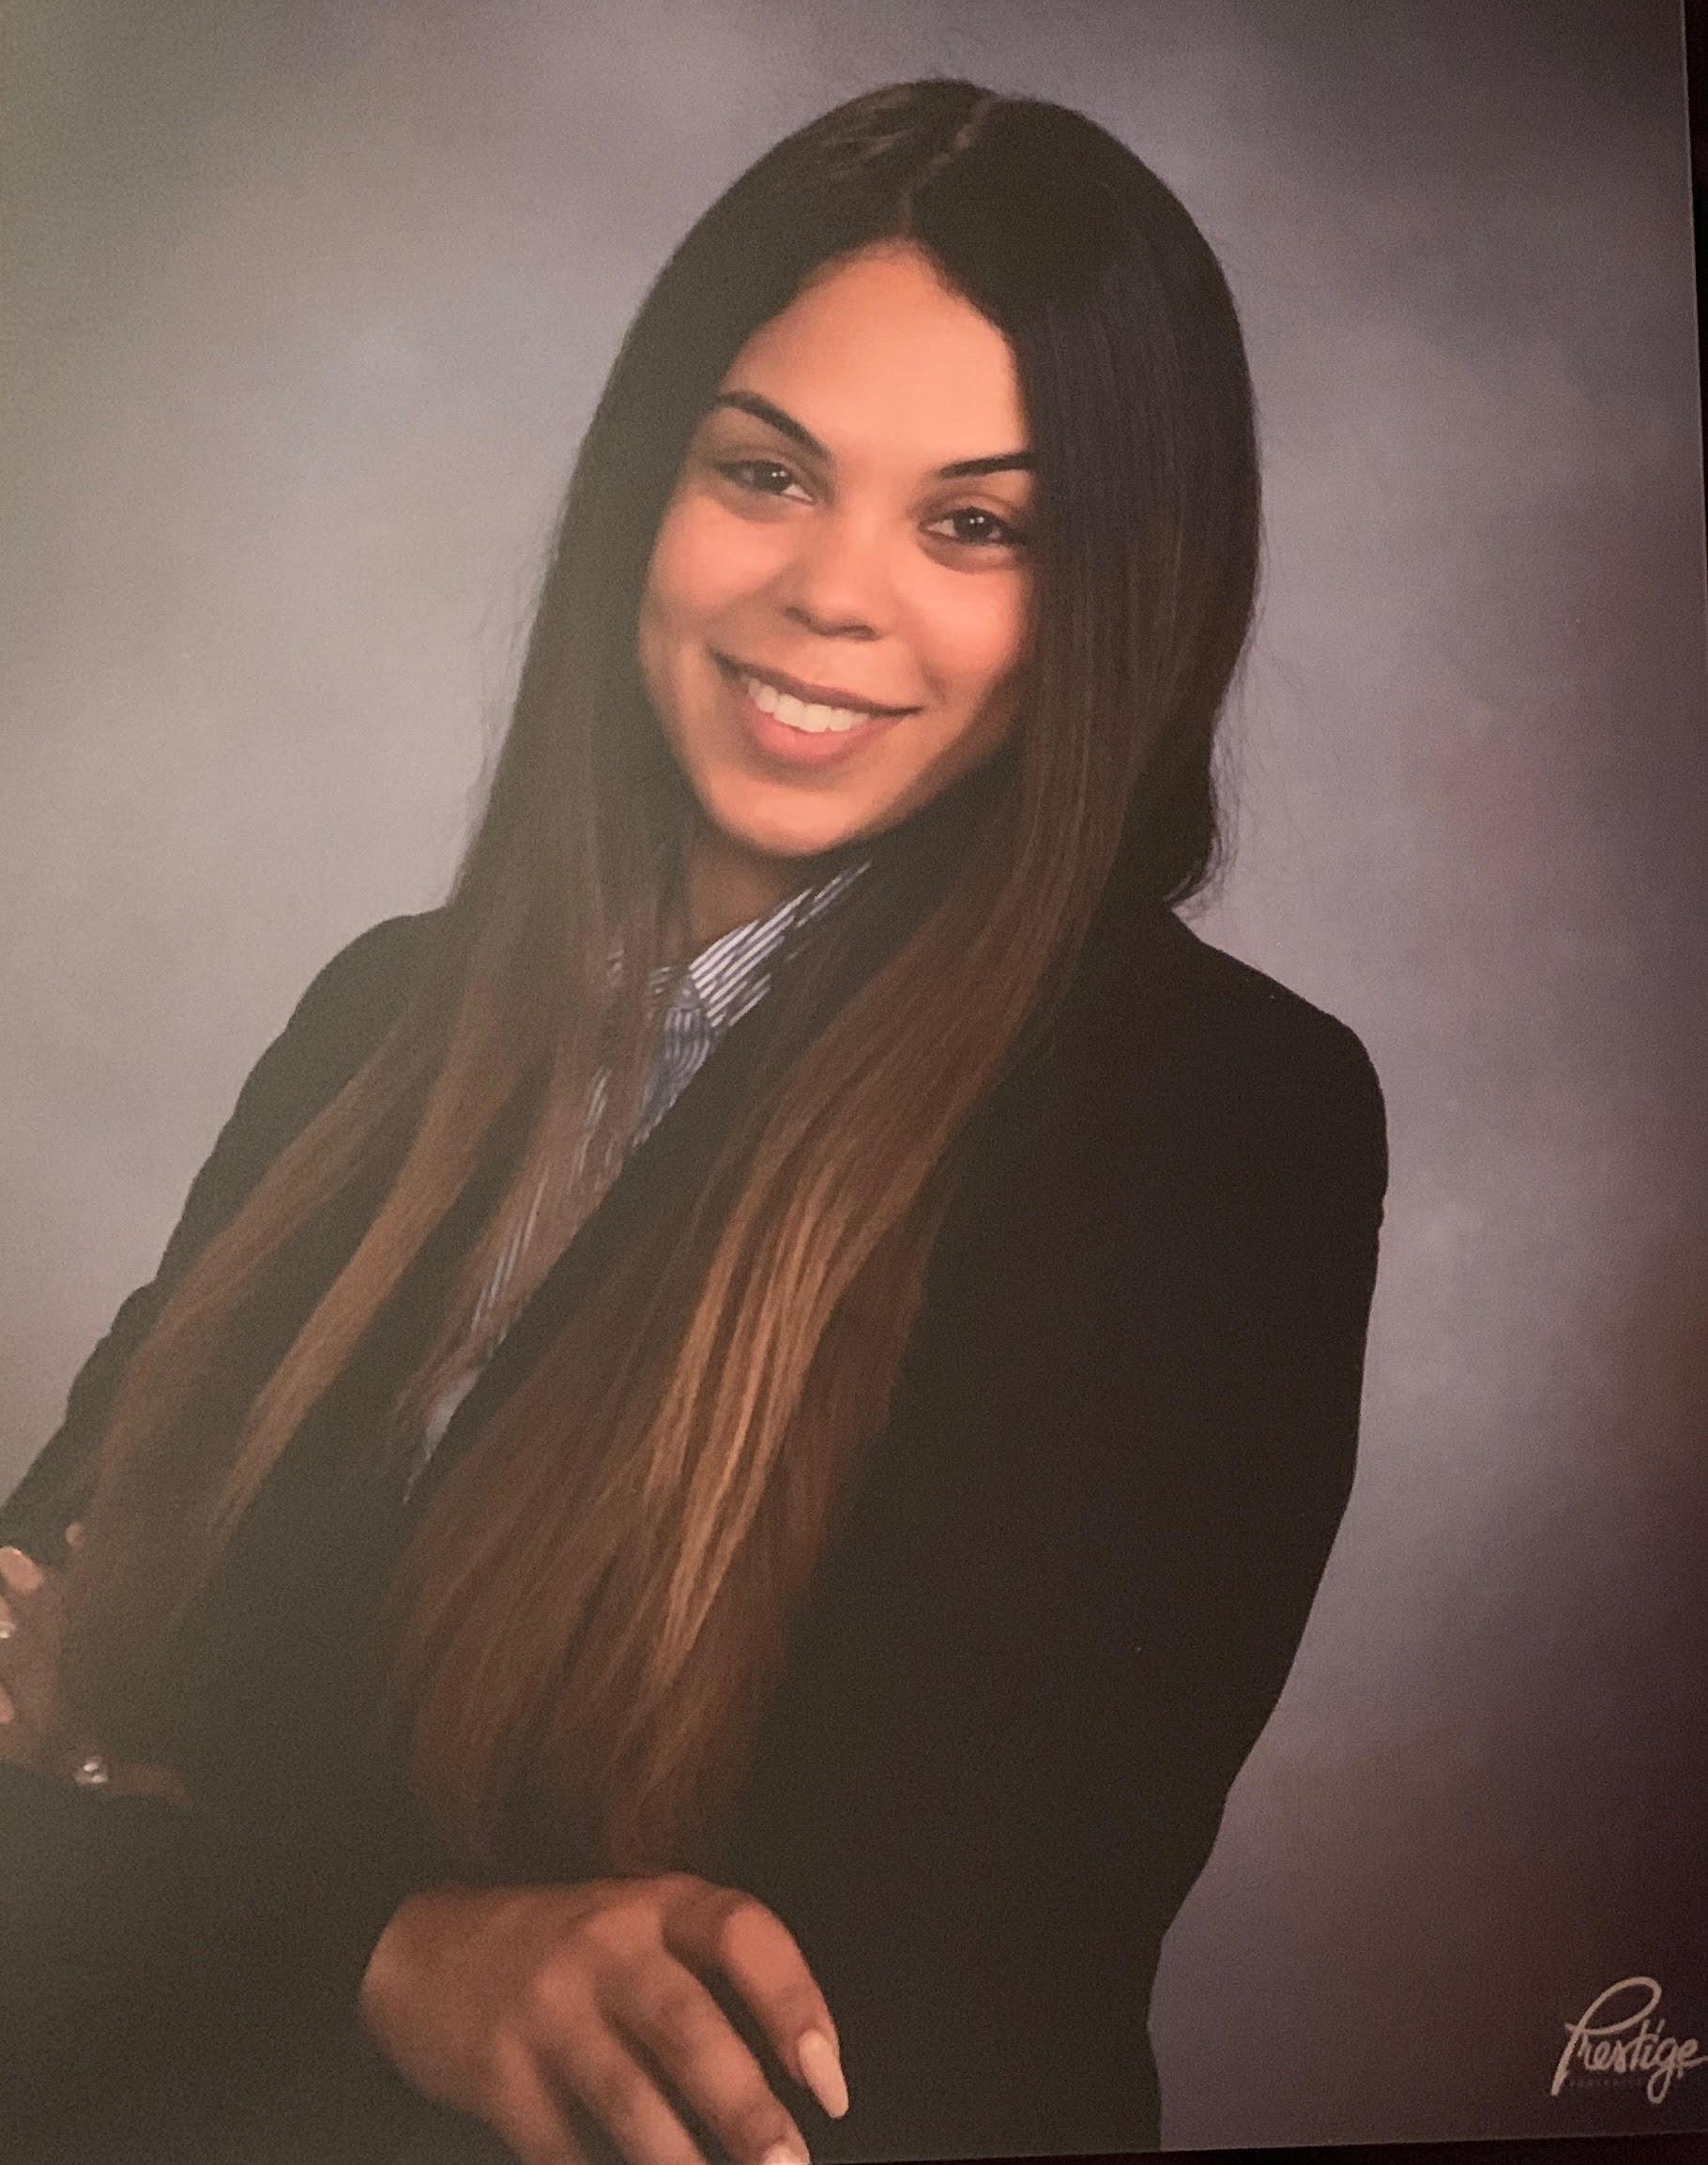 2020 US Army Women's Foundation 2020 Scholarship Recipient Claren Kaufhold